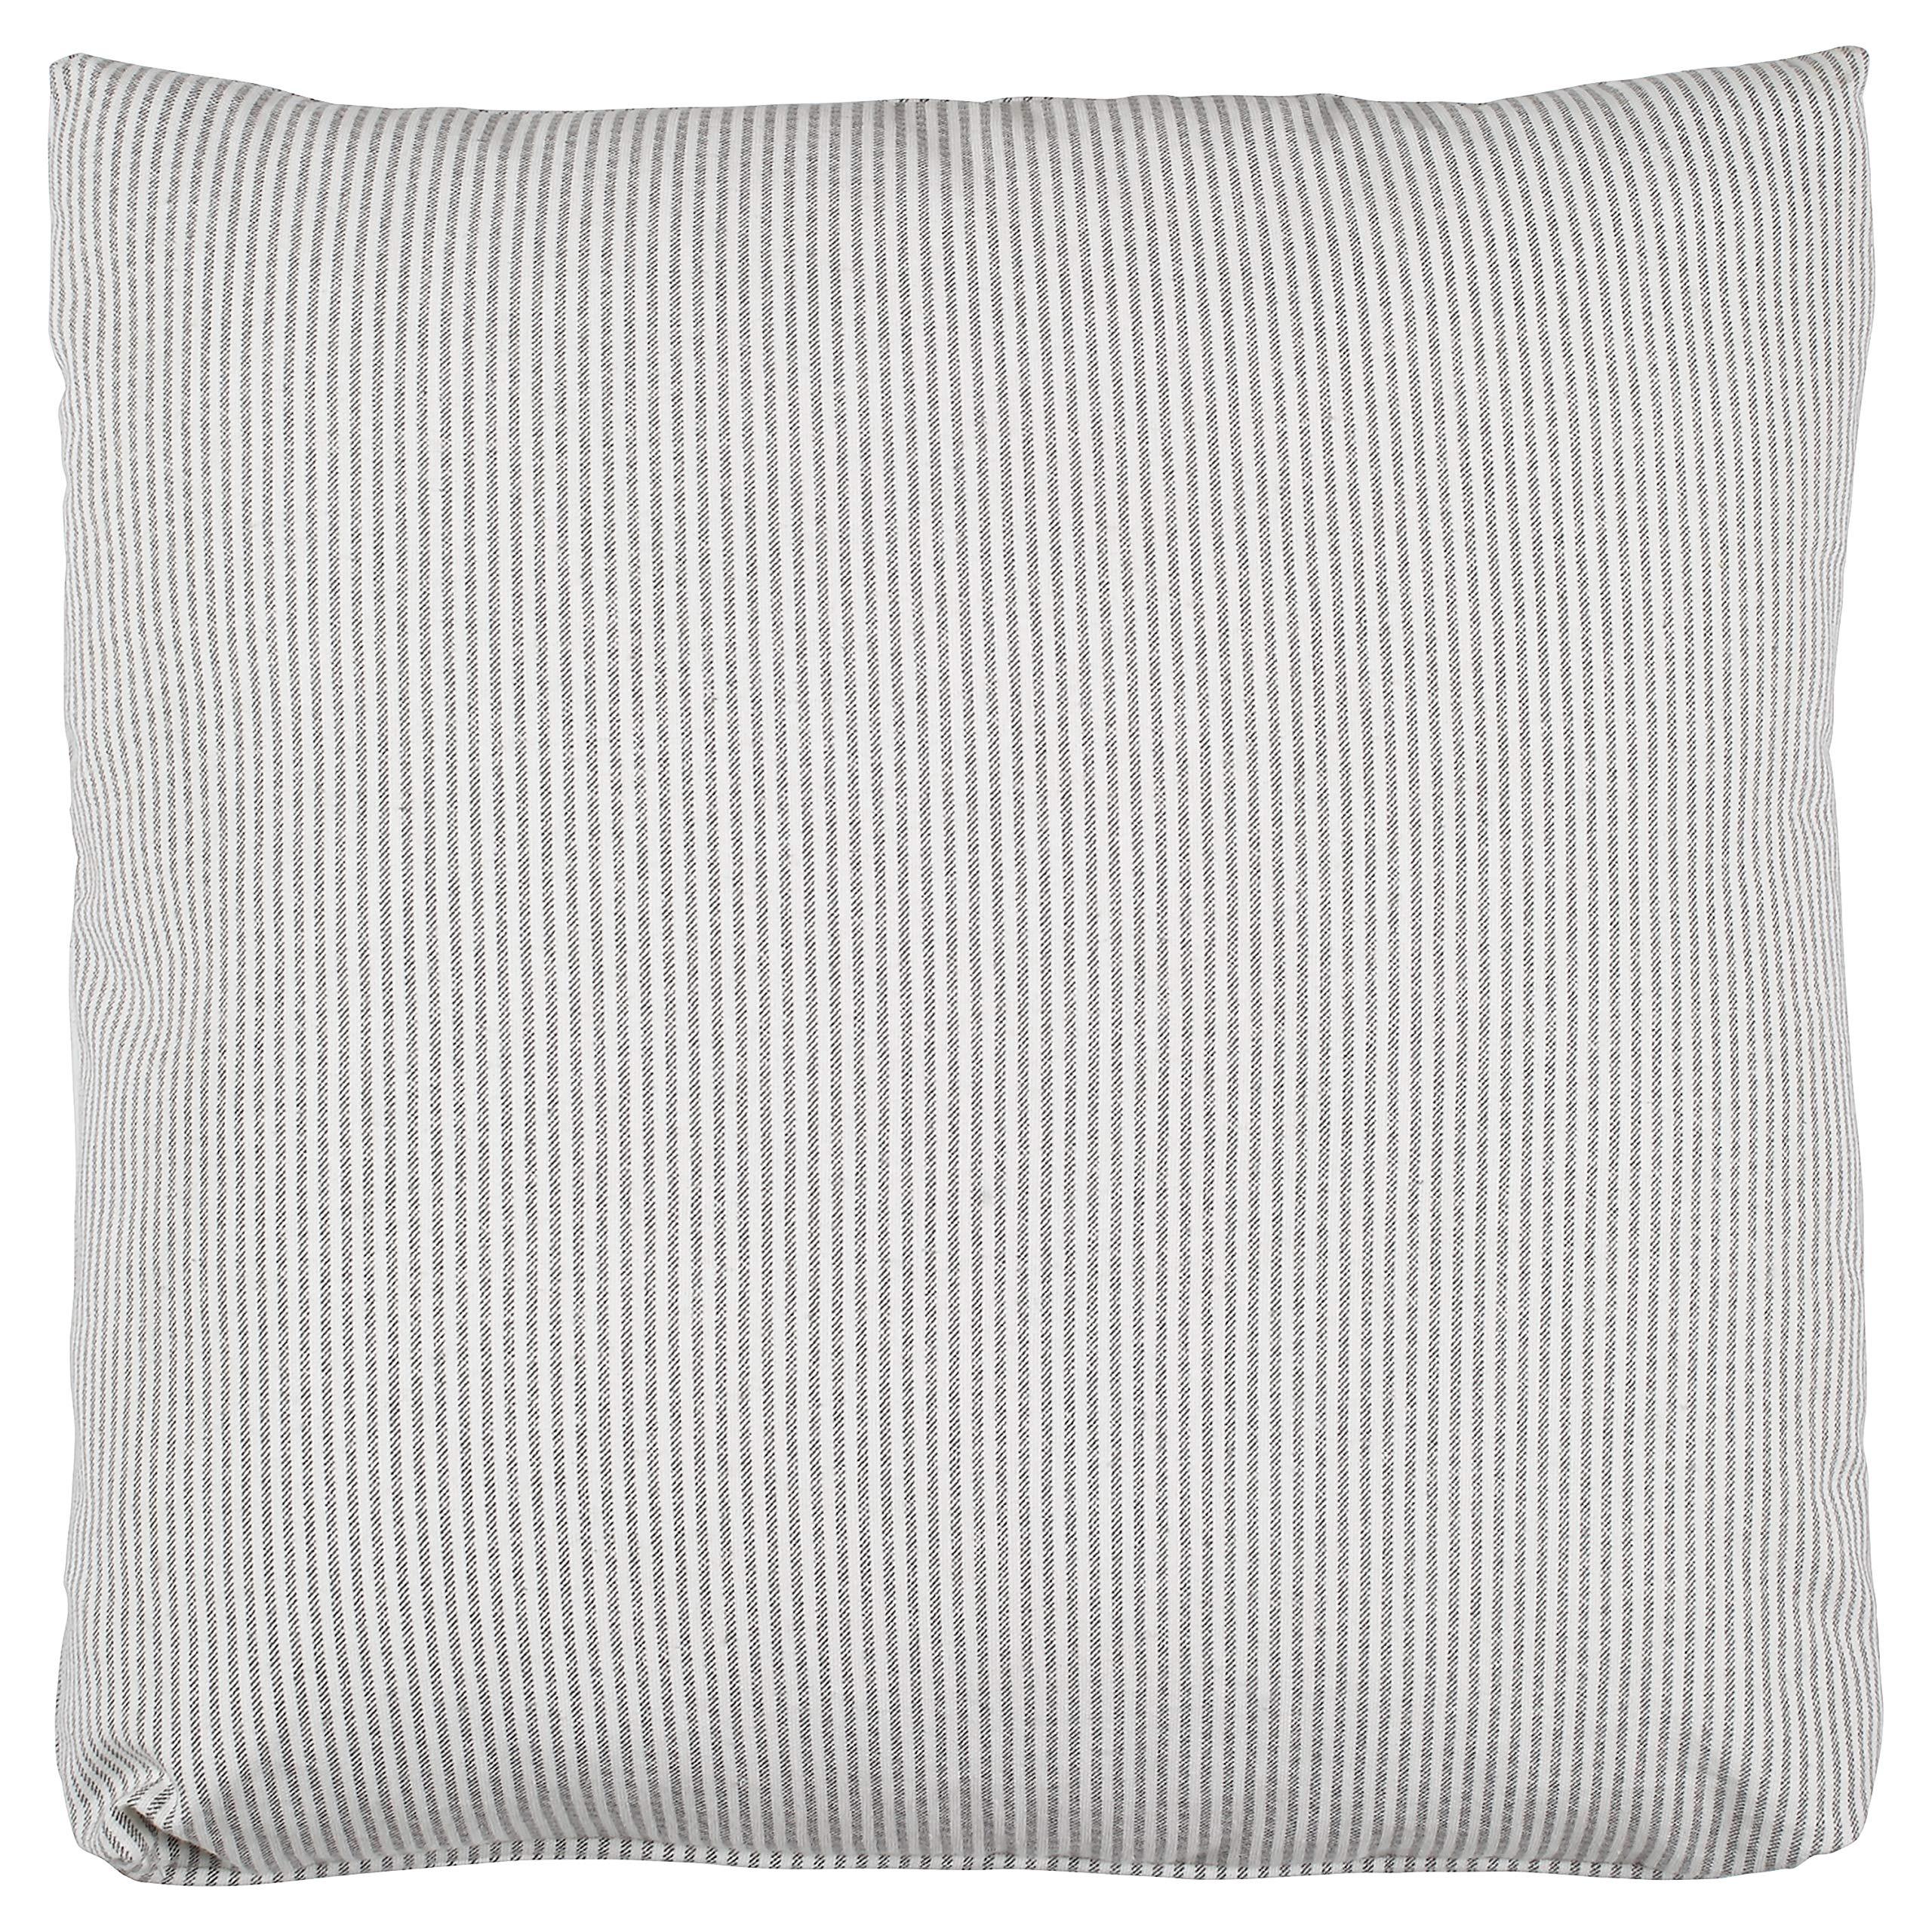 Stone & Beam Farmhouse Thin Stripe Pillow, 19'', Edgar Graphite by Stone & Beam